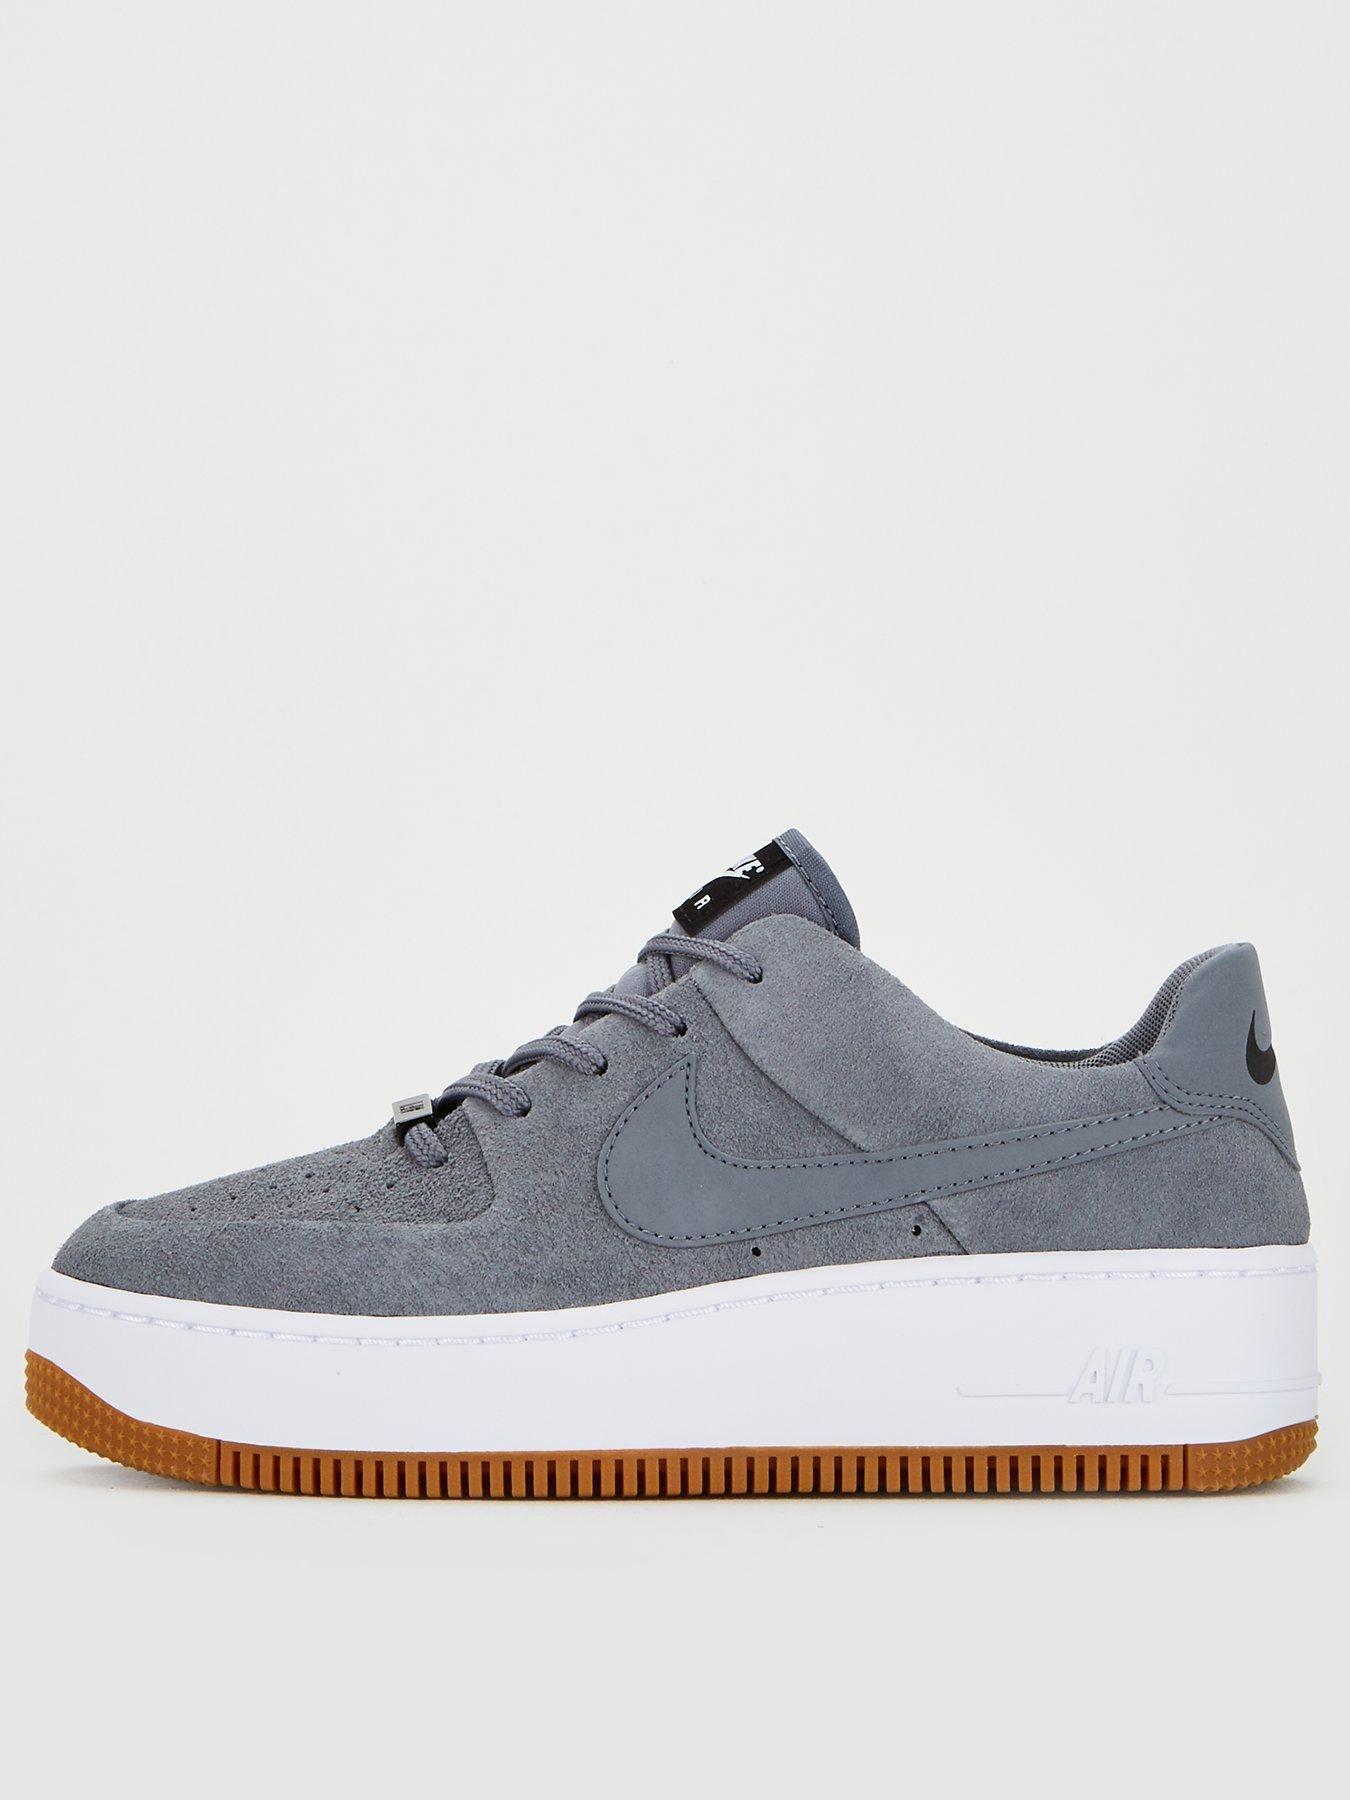 Nike Air Force 1 Sage Low GreyBlackWhite, GreyBlack